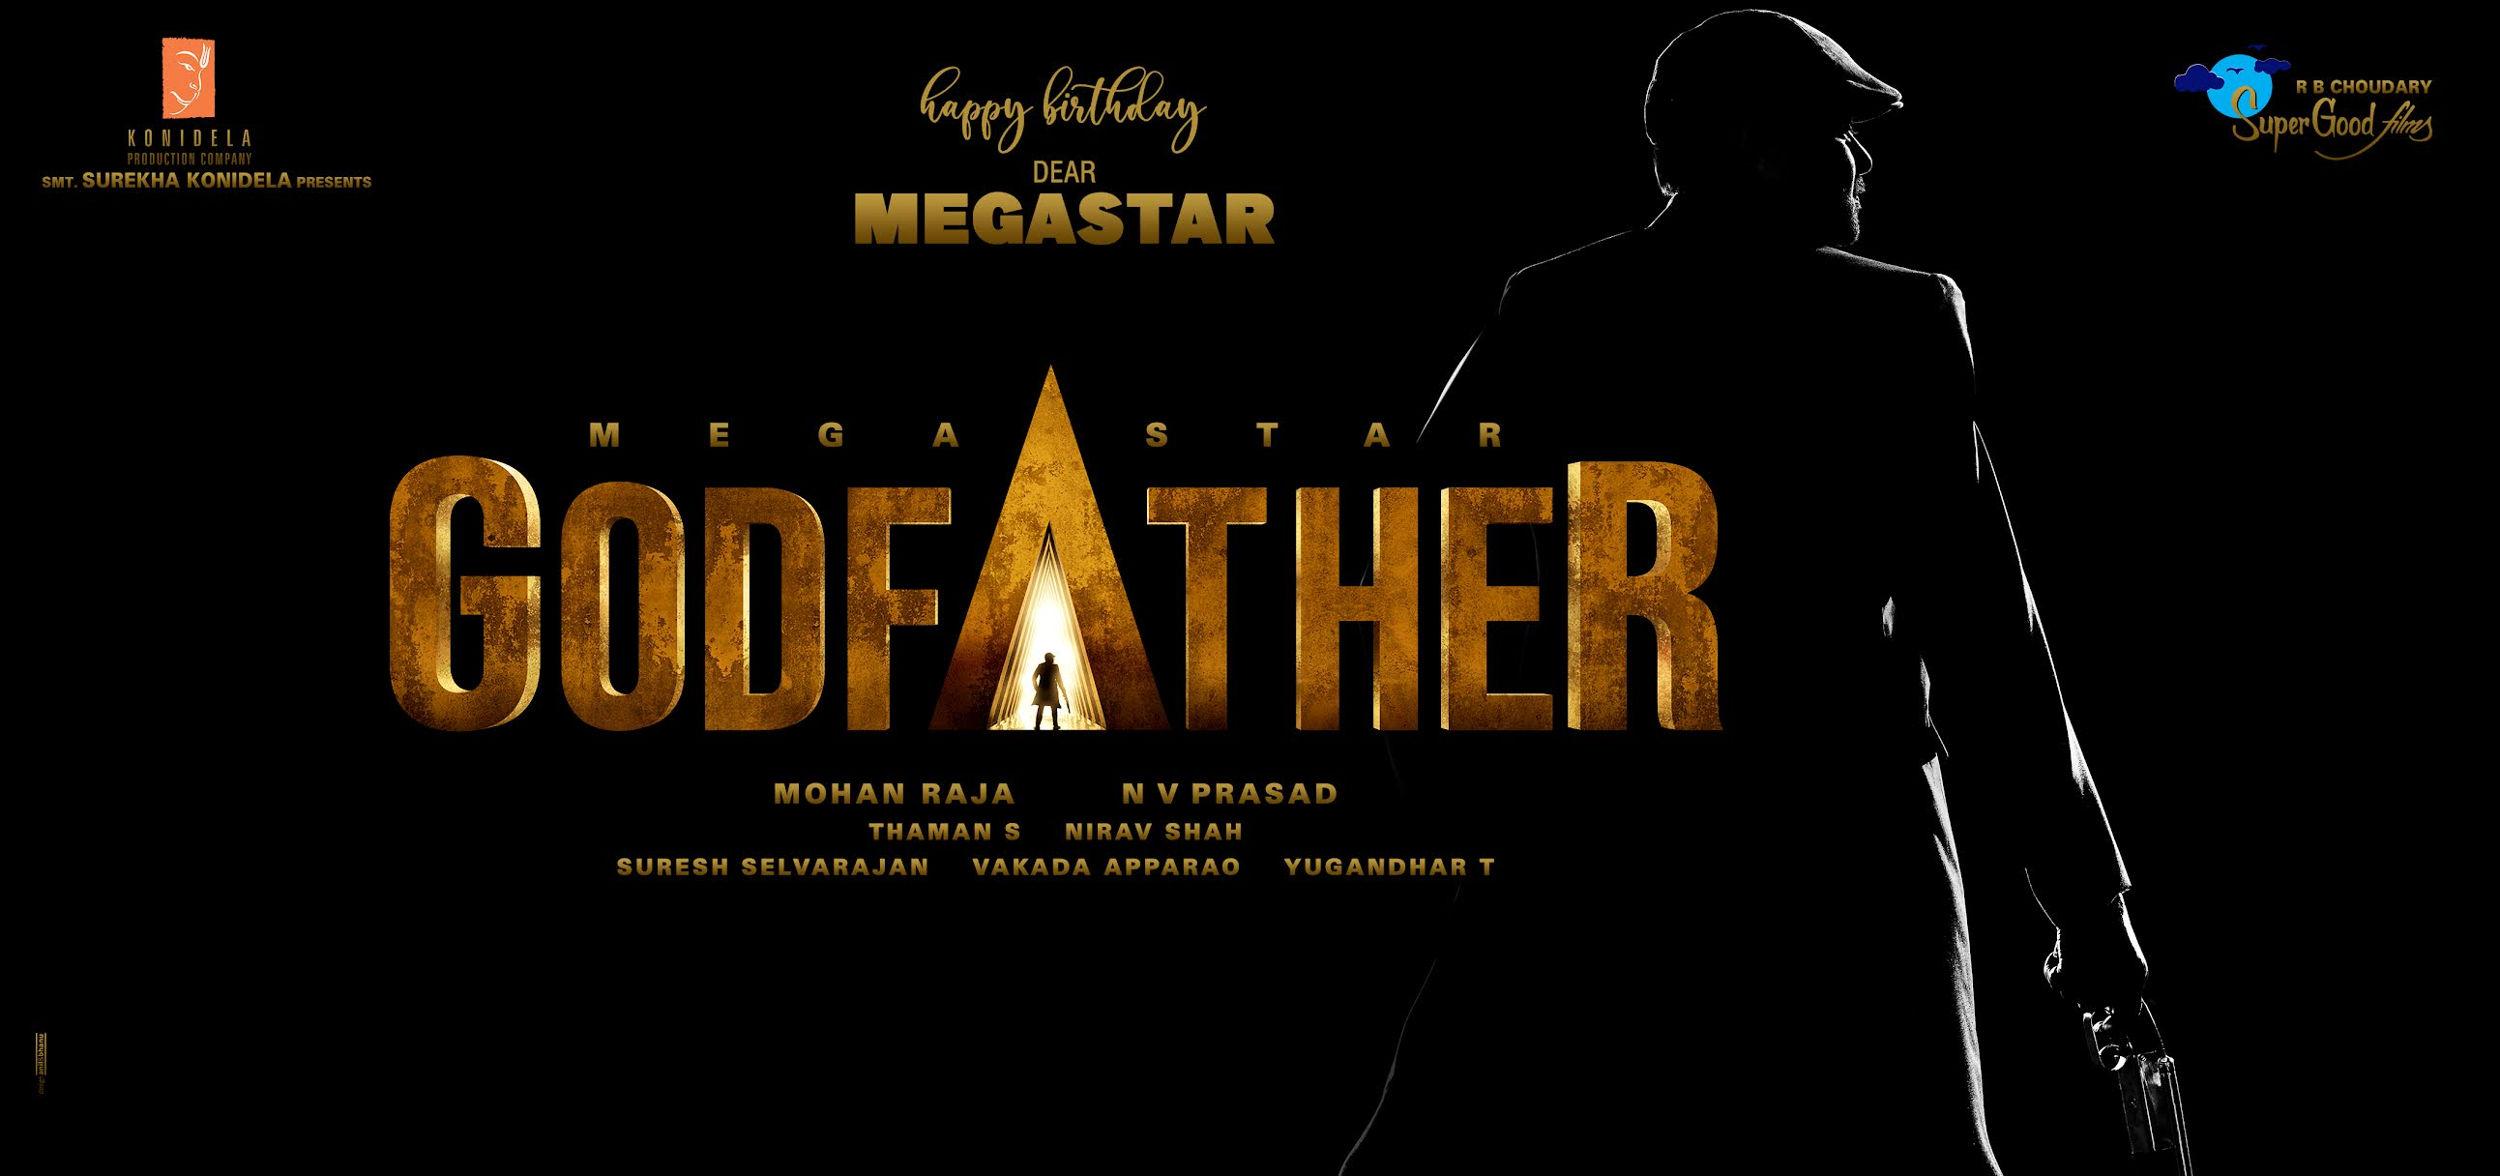 Megastar Chiranjeevi Mohan Raja Konidela Productions And Super Good Films Chiru153 Titled Godfather